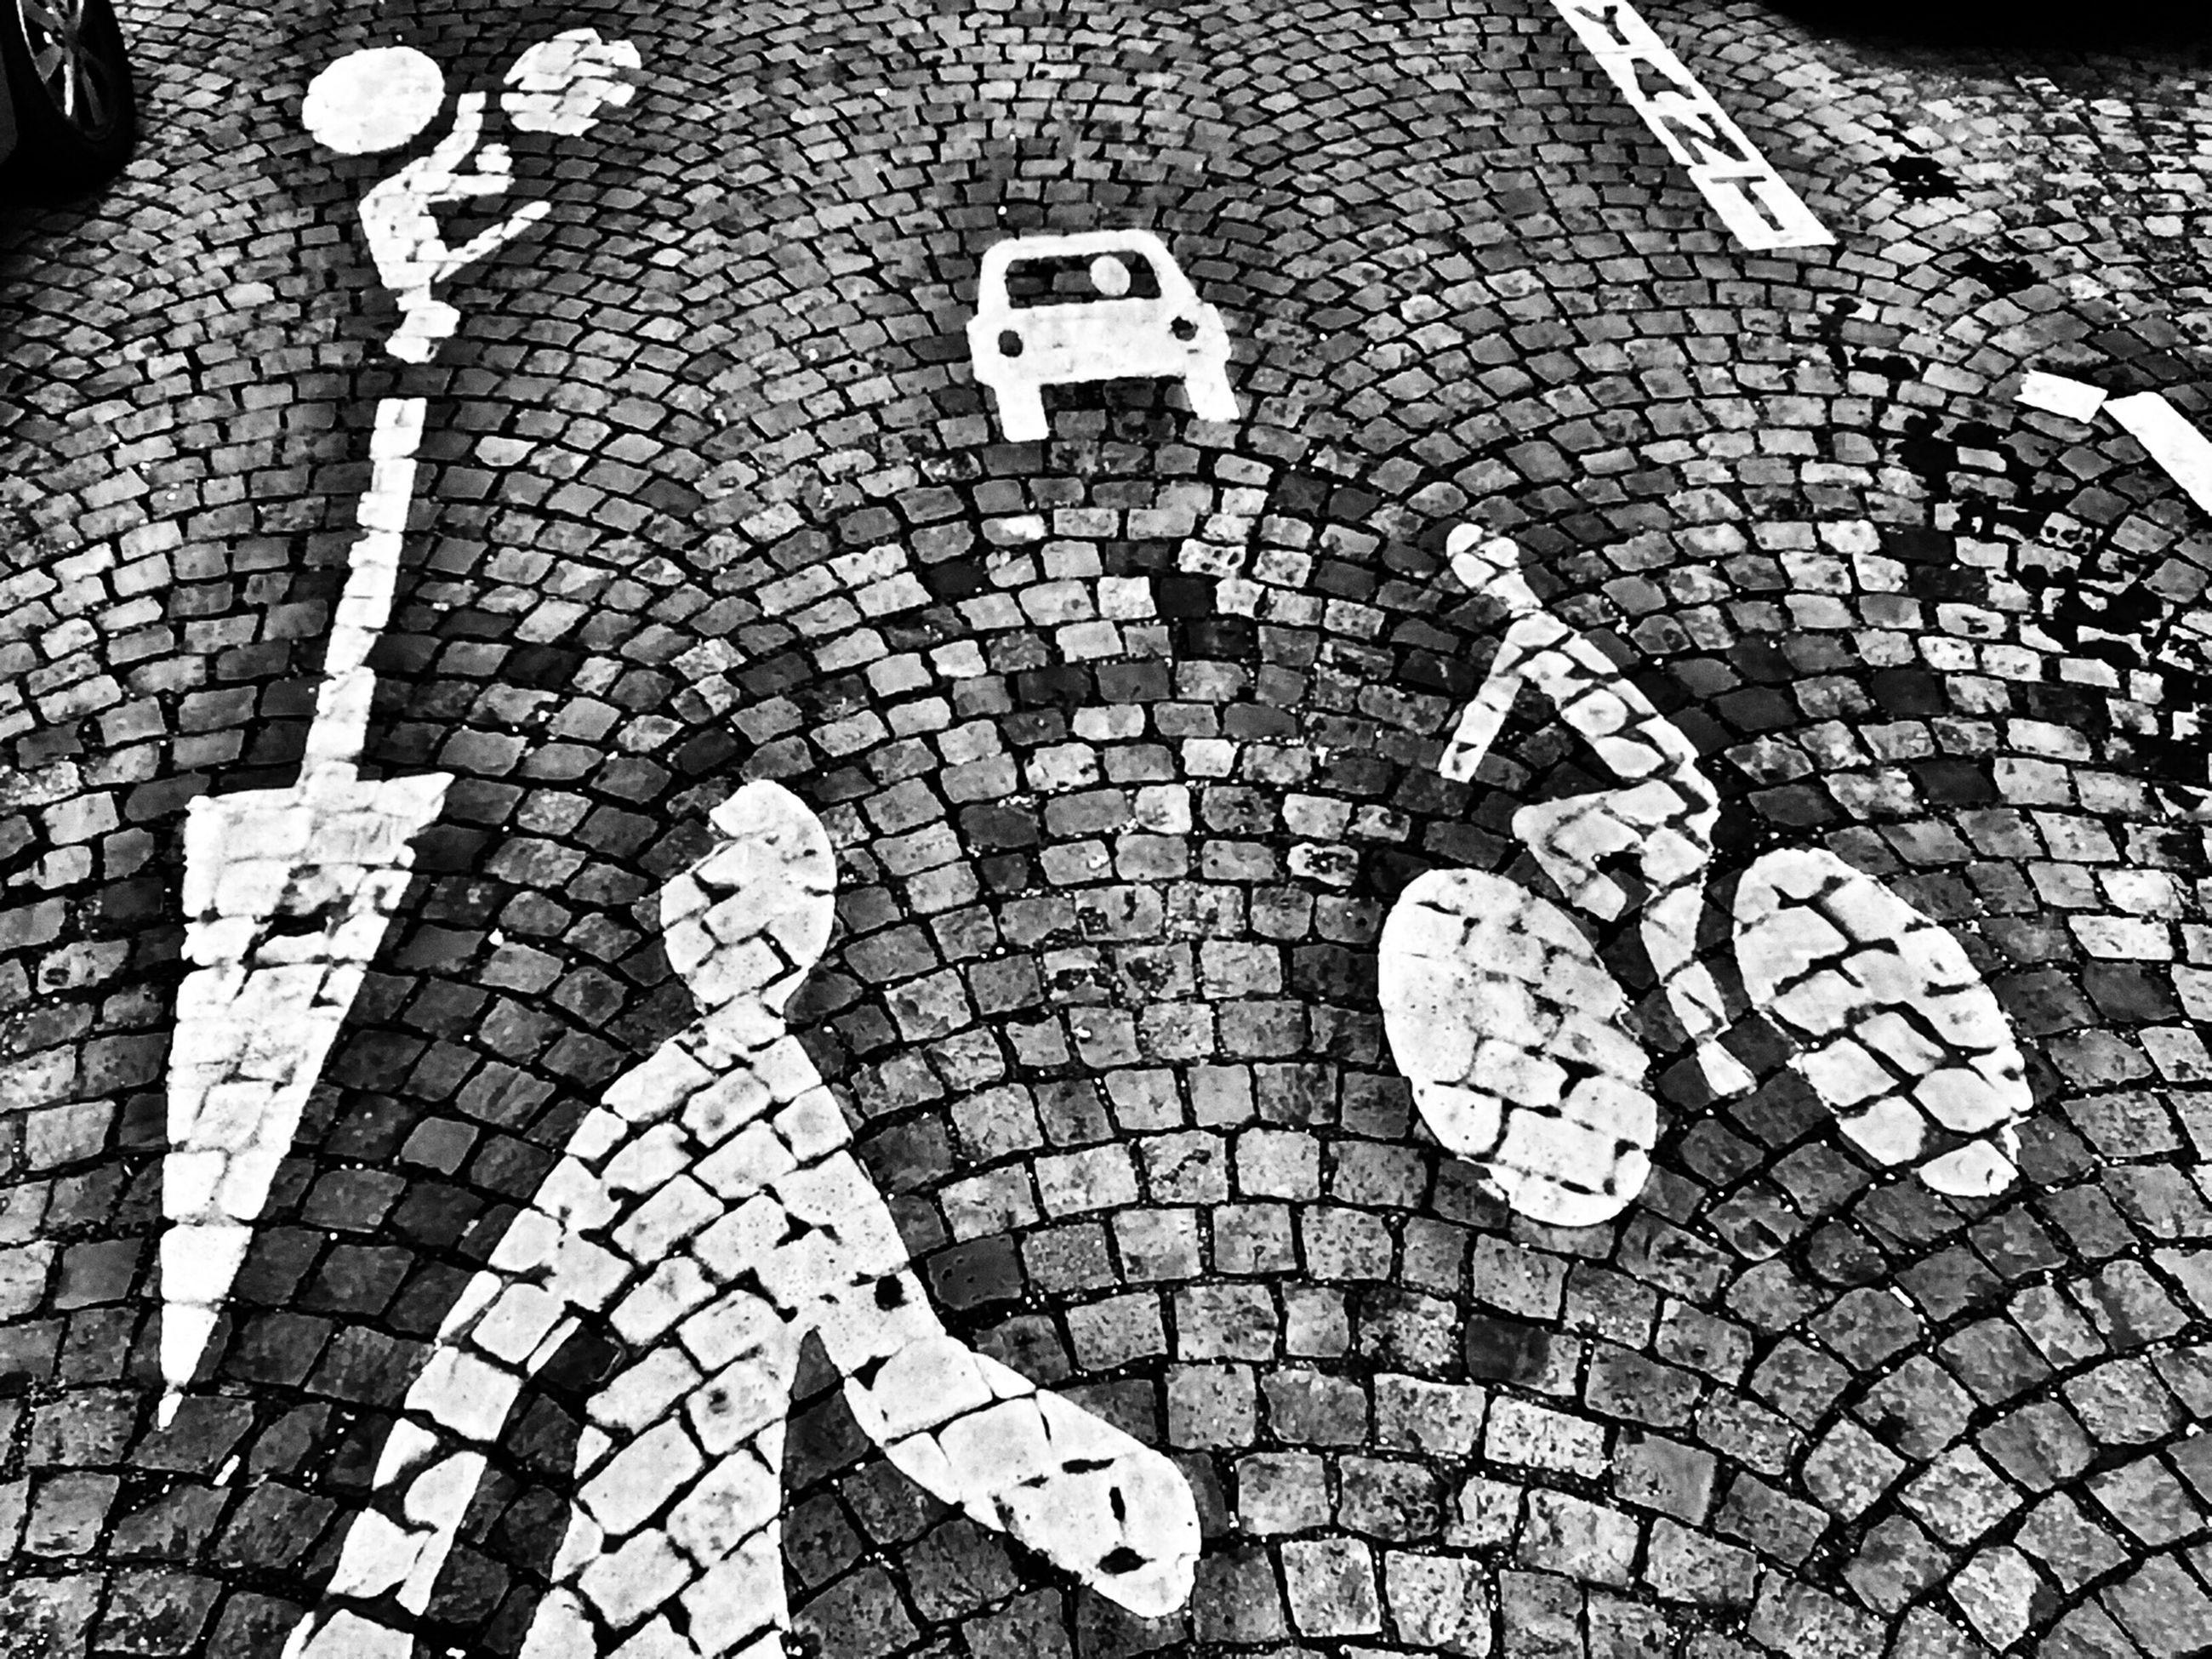 high angle view, cobblestone, paving stone, street, communication, text, pattern, sidewalk, footpath, road marking, western script, tiled floor, pavement, shadow, day, outdoors, sunlight, tile, capital letter, asphalt